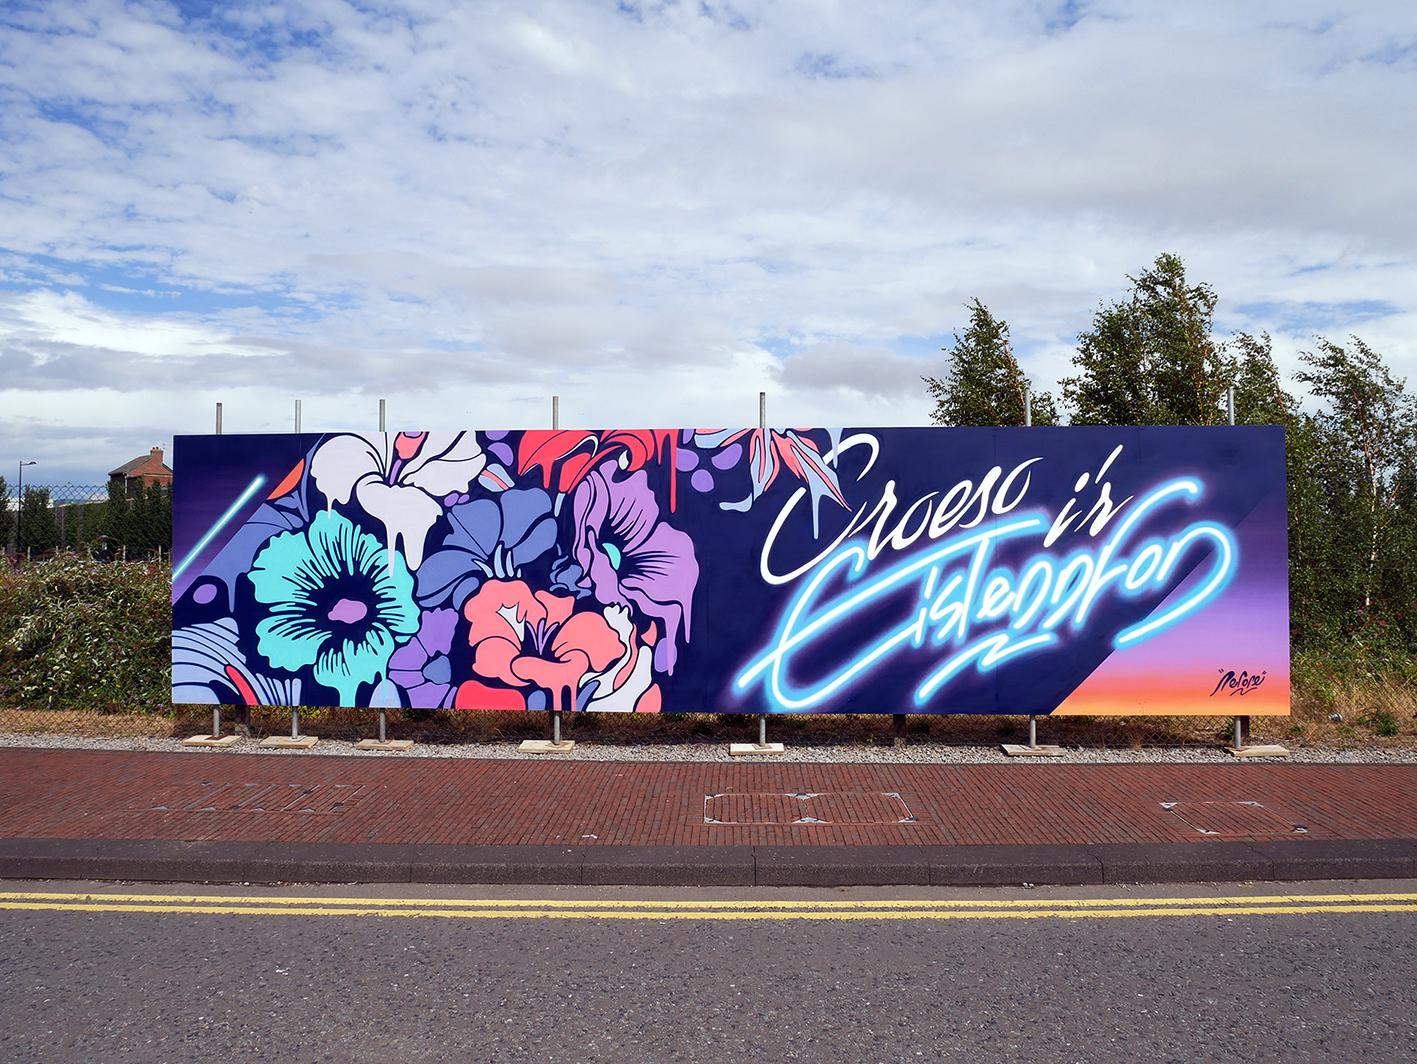 Nerone-street-art-Cardif-neone 4